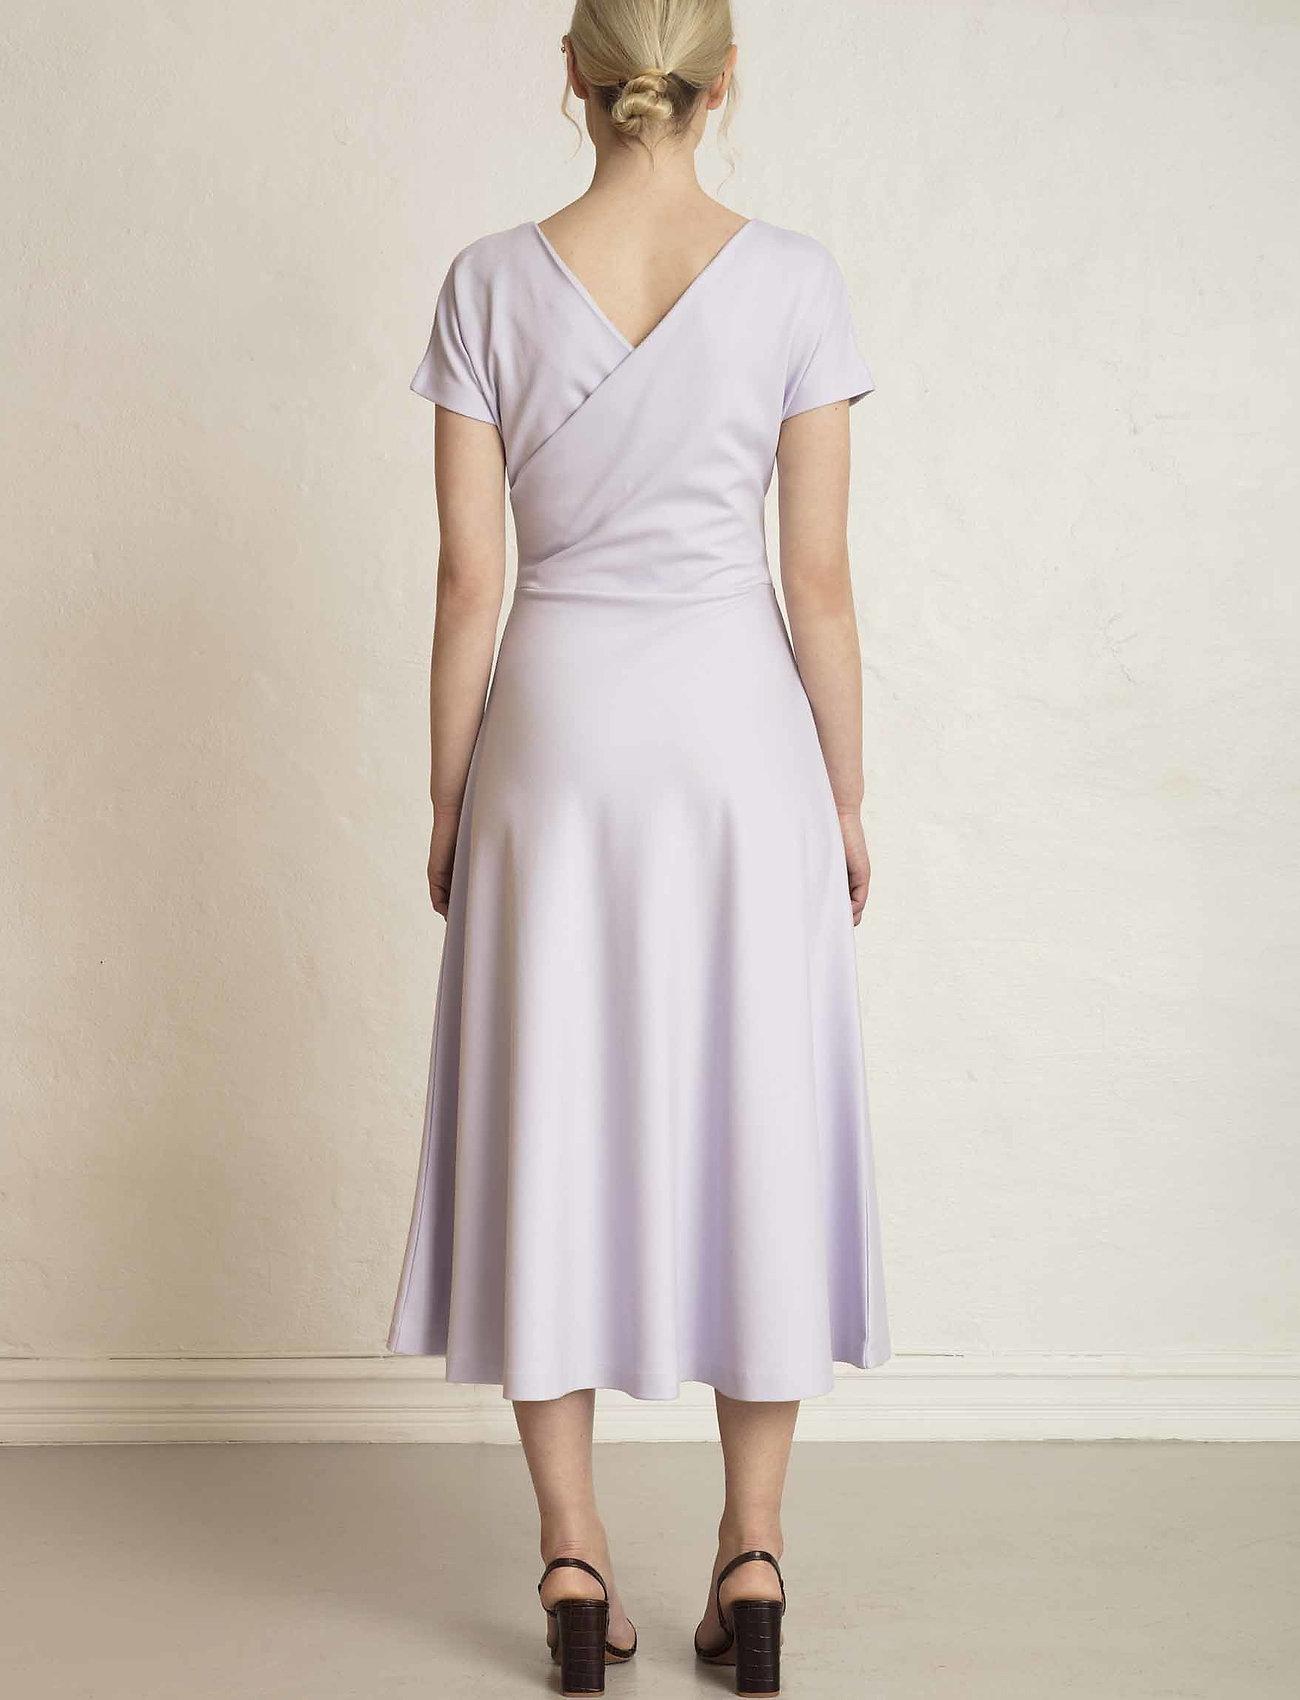 Residus ANIS ECOVERO DRESS - Kleider PURPLE HEATHER - Damen Kleidung